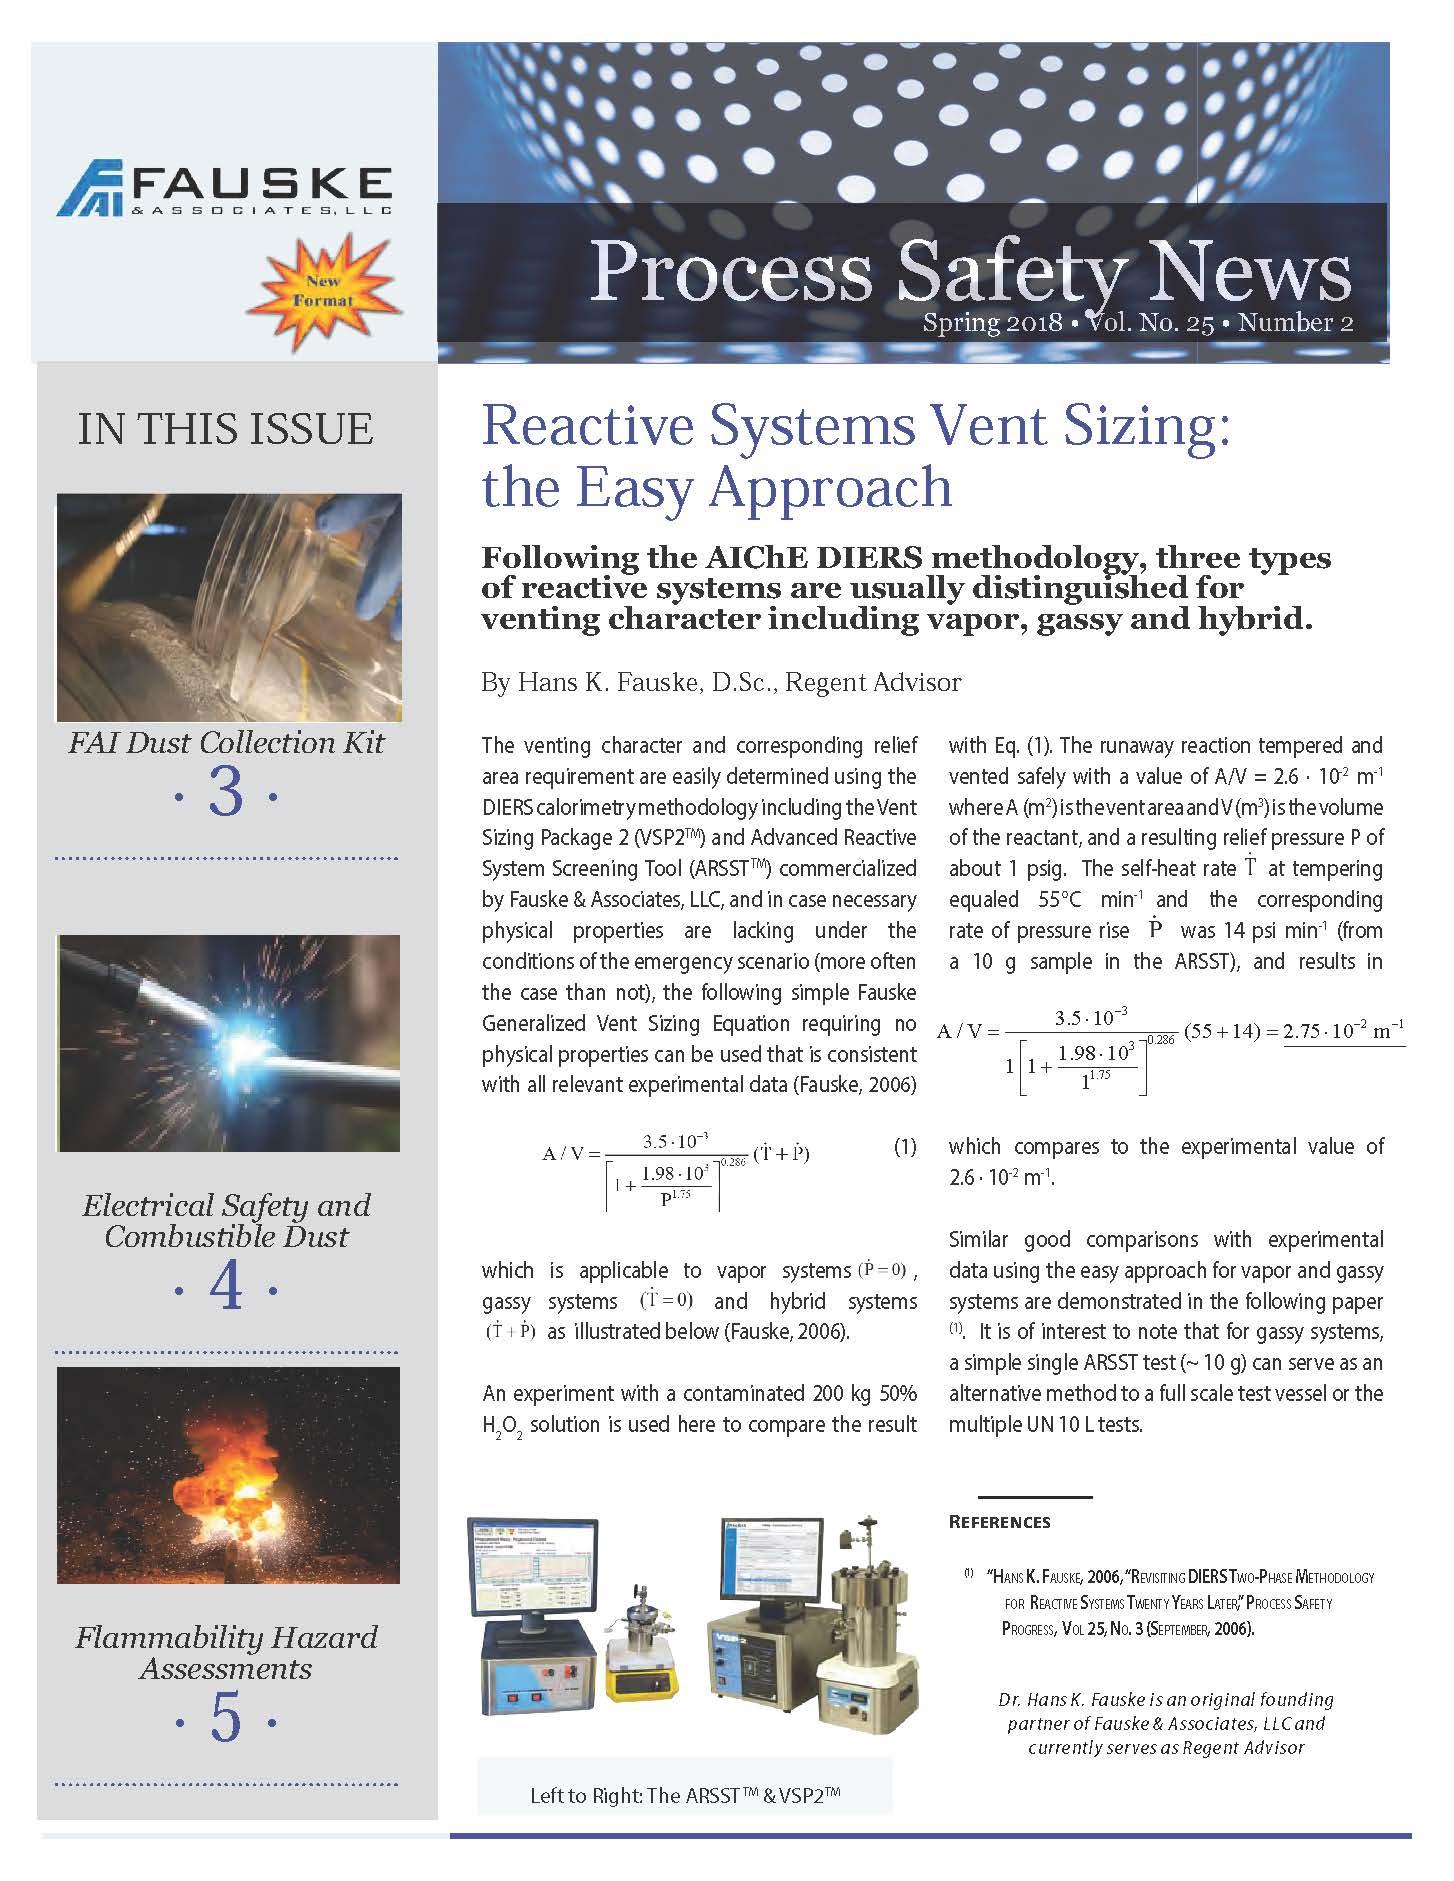 Spring 2018 Process Safety Newsletter